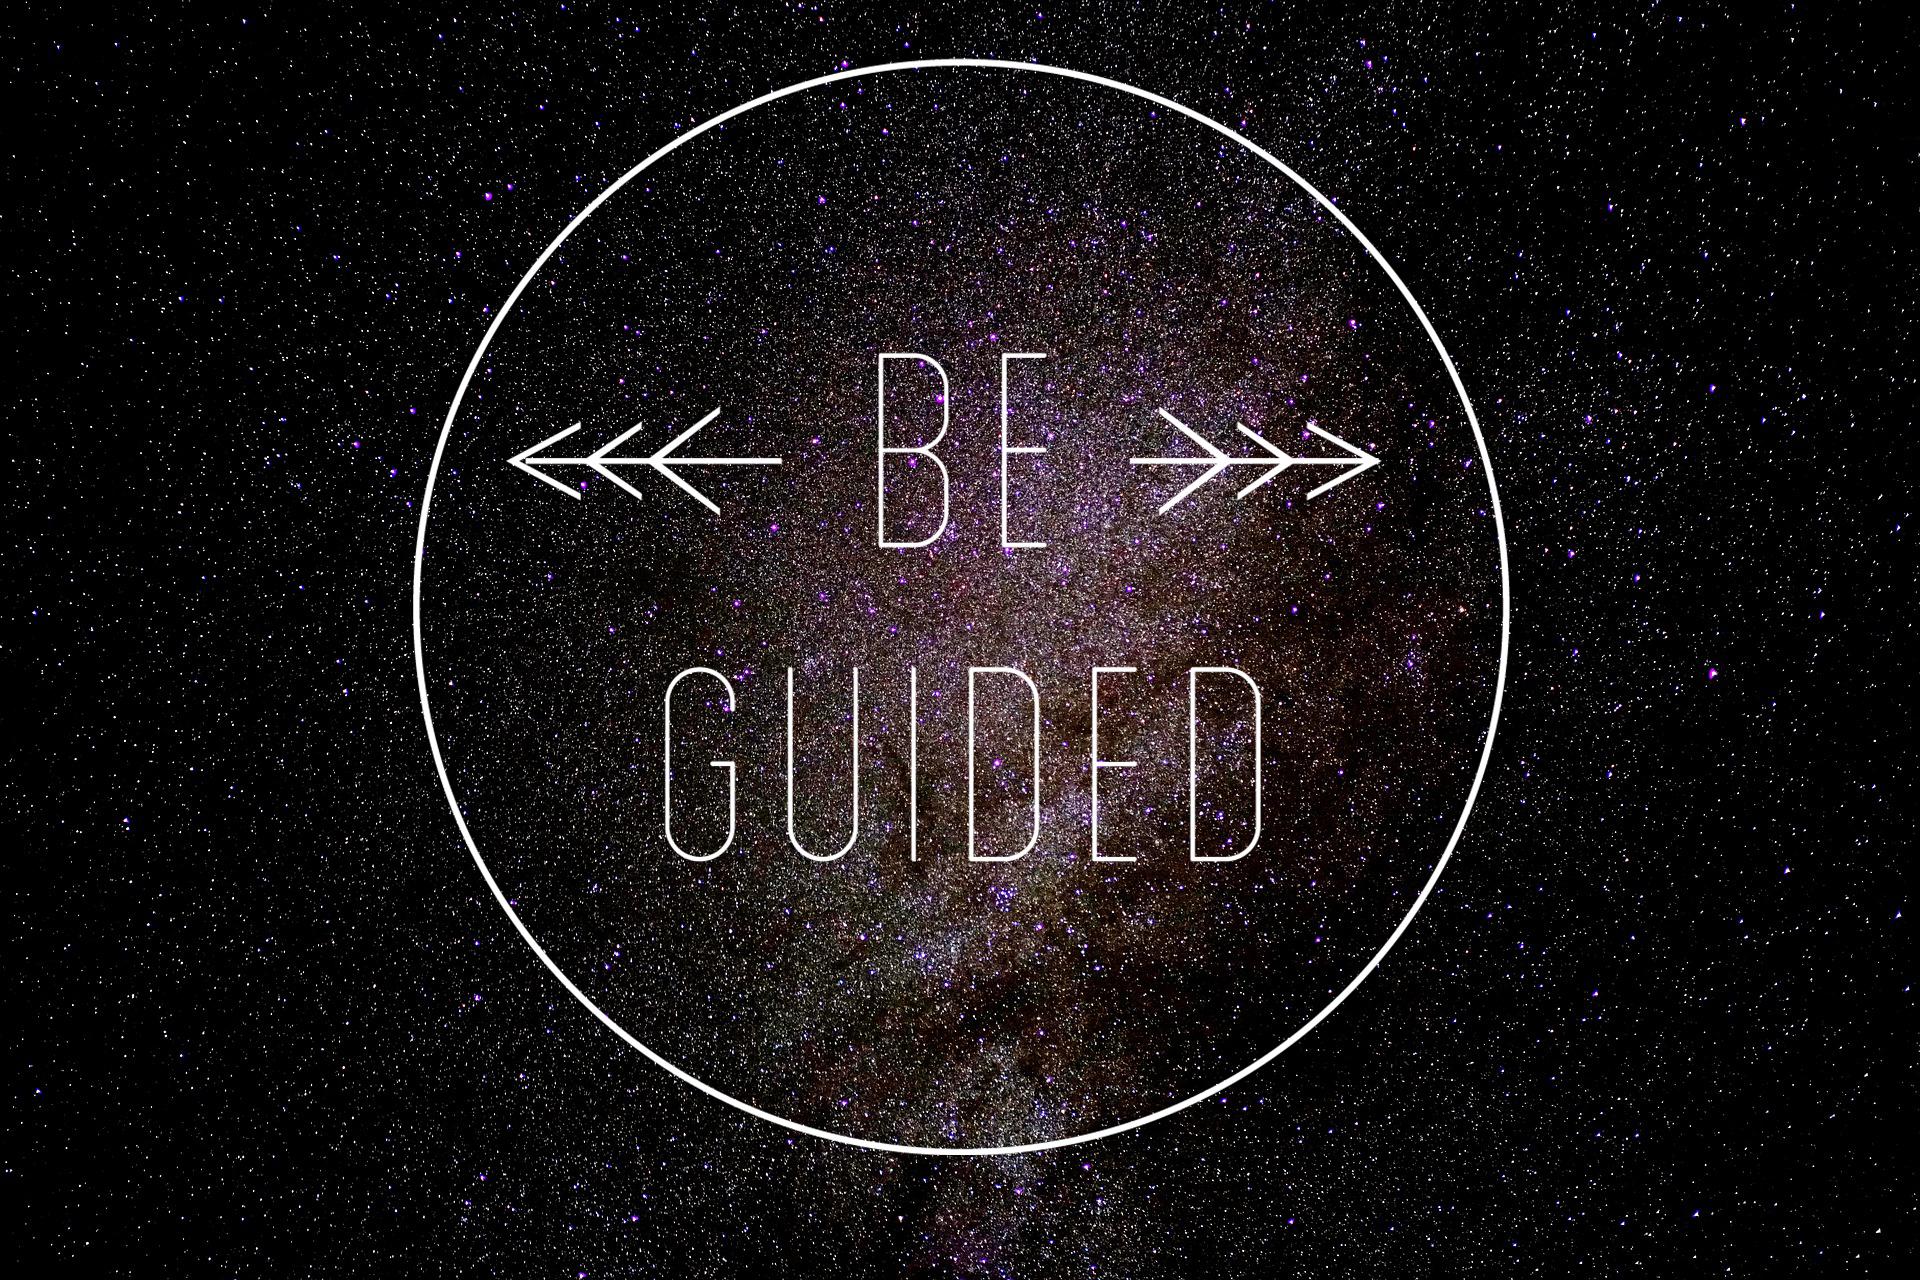 logo on stars.jpg